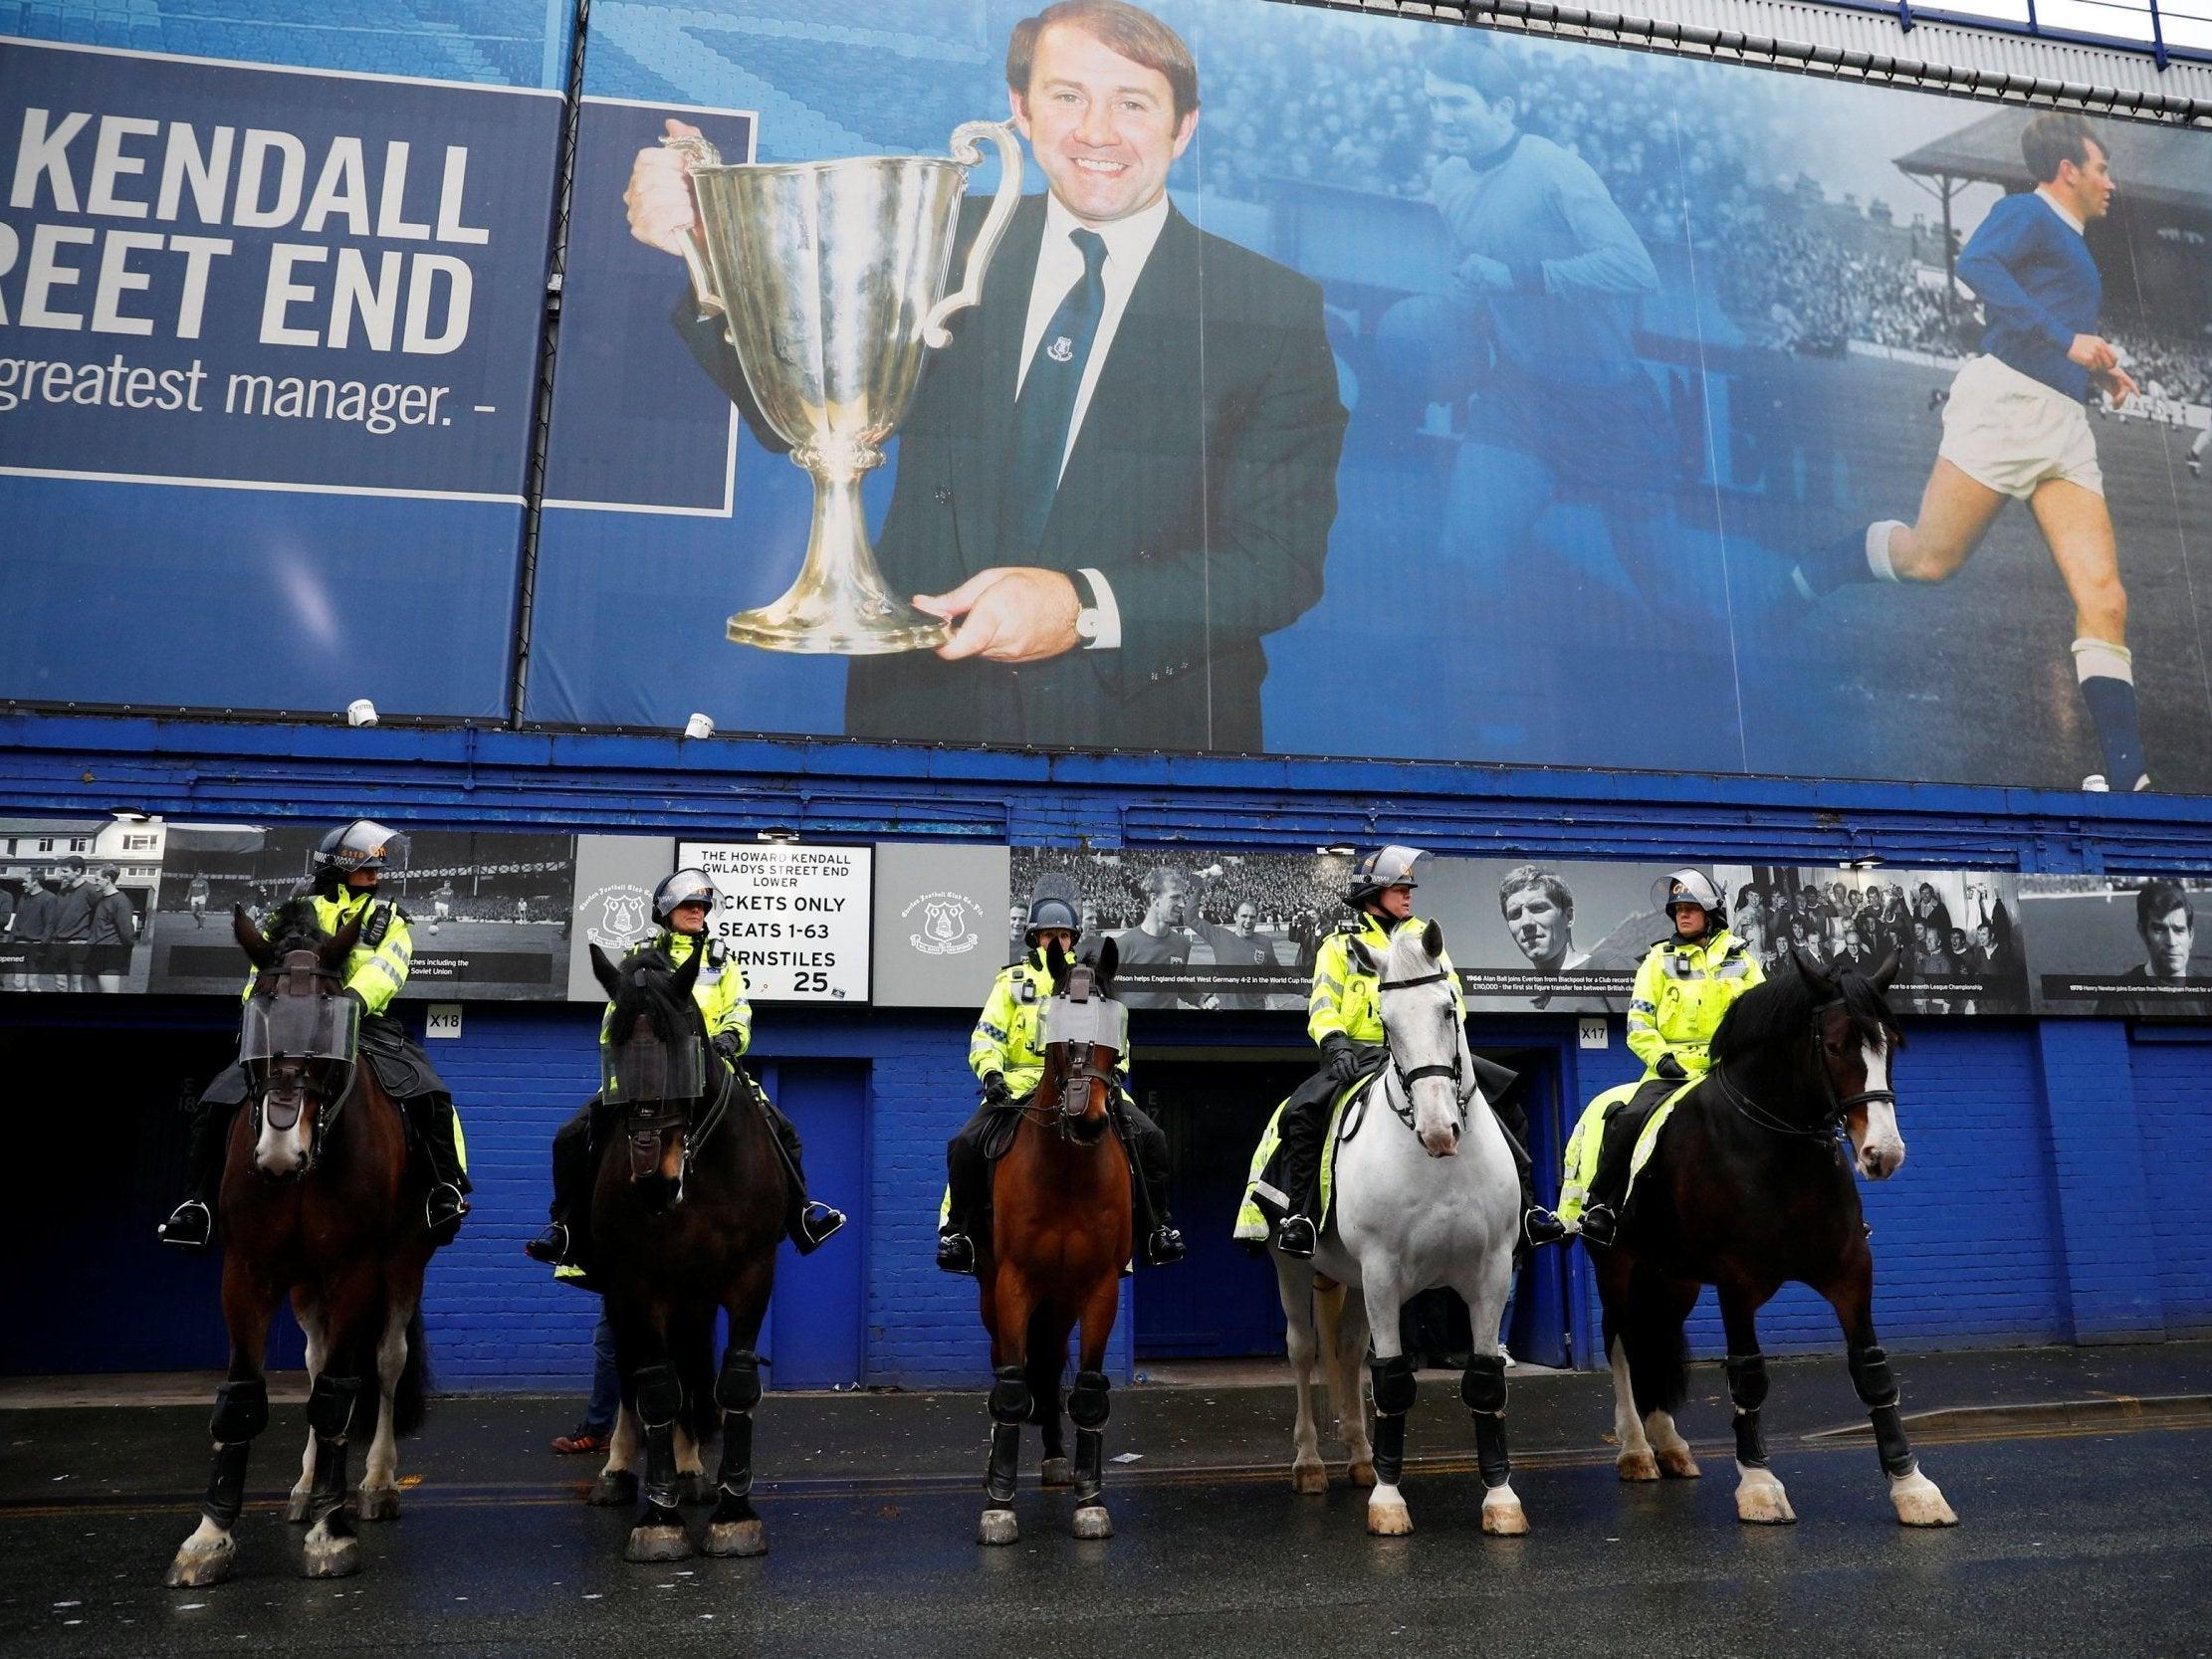 Everton vs Liverpool - LIVE: Stream, score, goals and ...